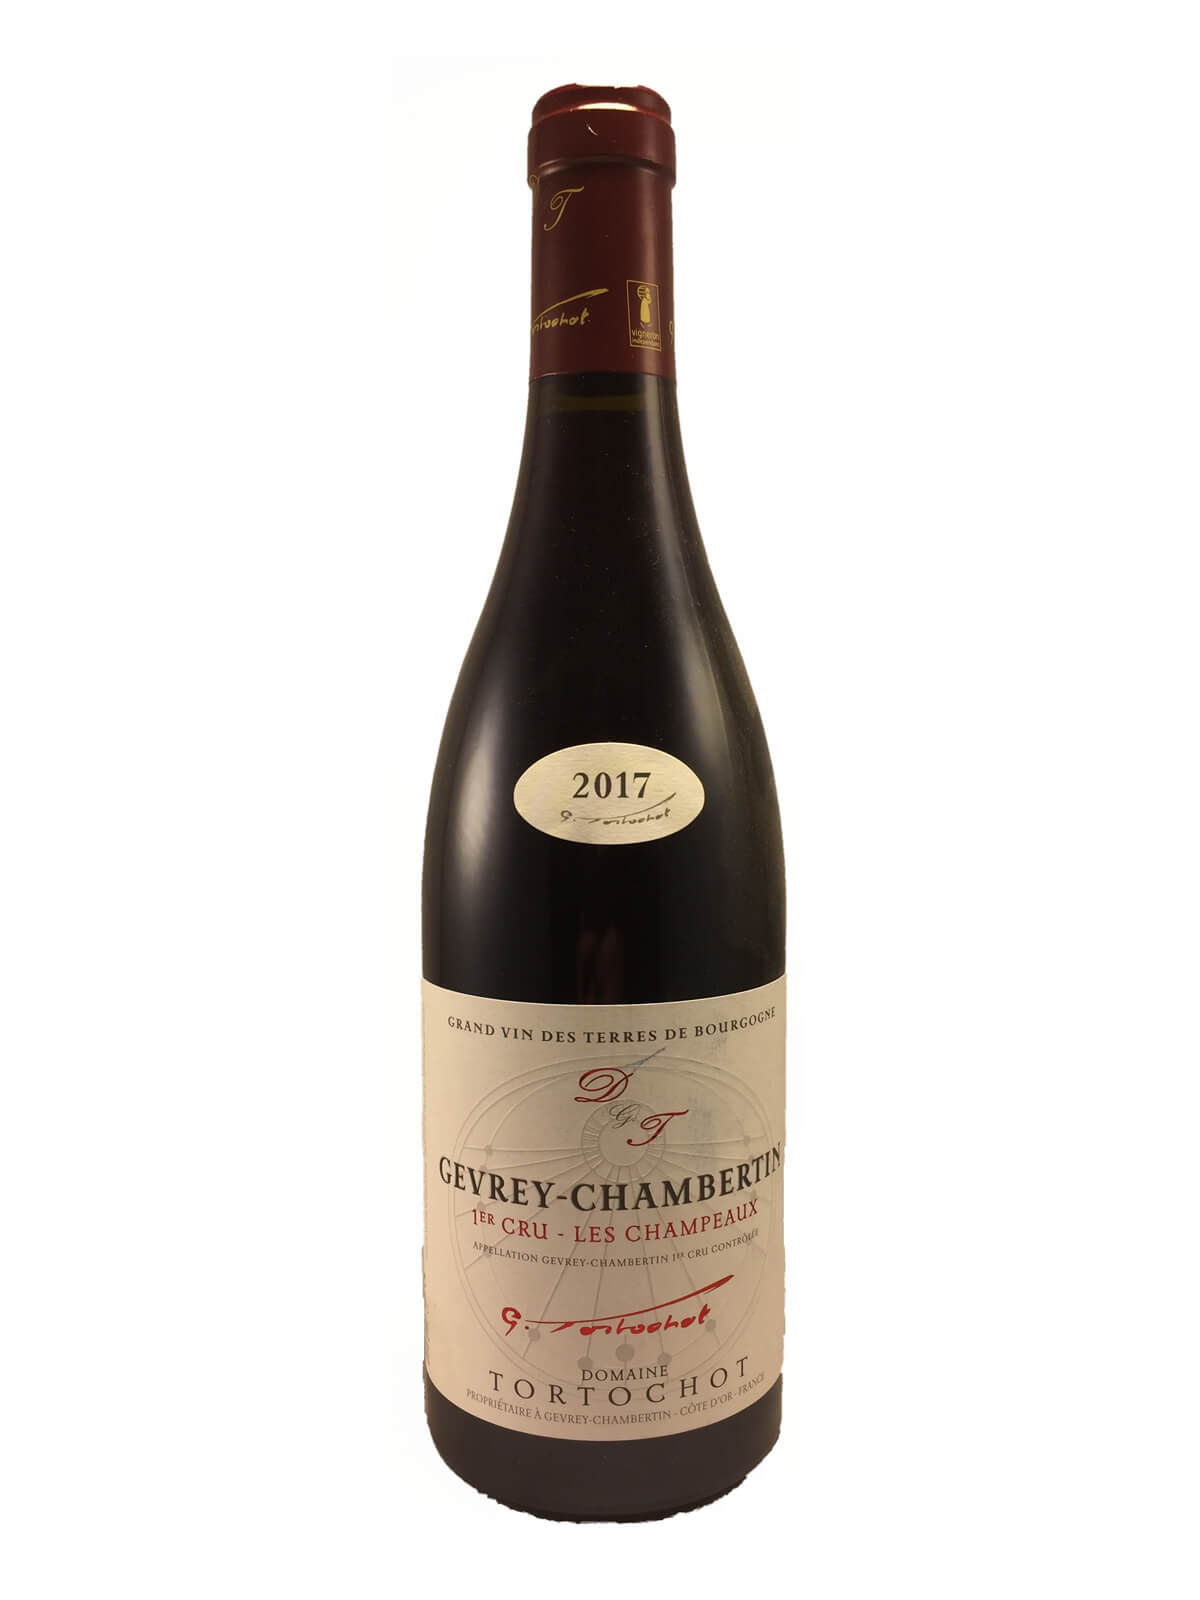 GEVREY CHAMBERTIN 1er Cru CHAMPEAUX 2017 Domaine TORTOCHOT